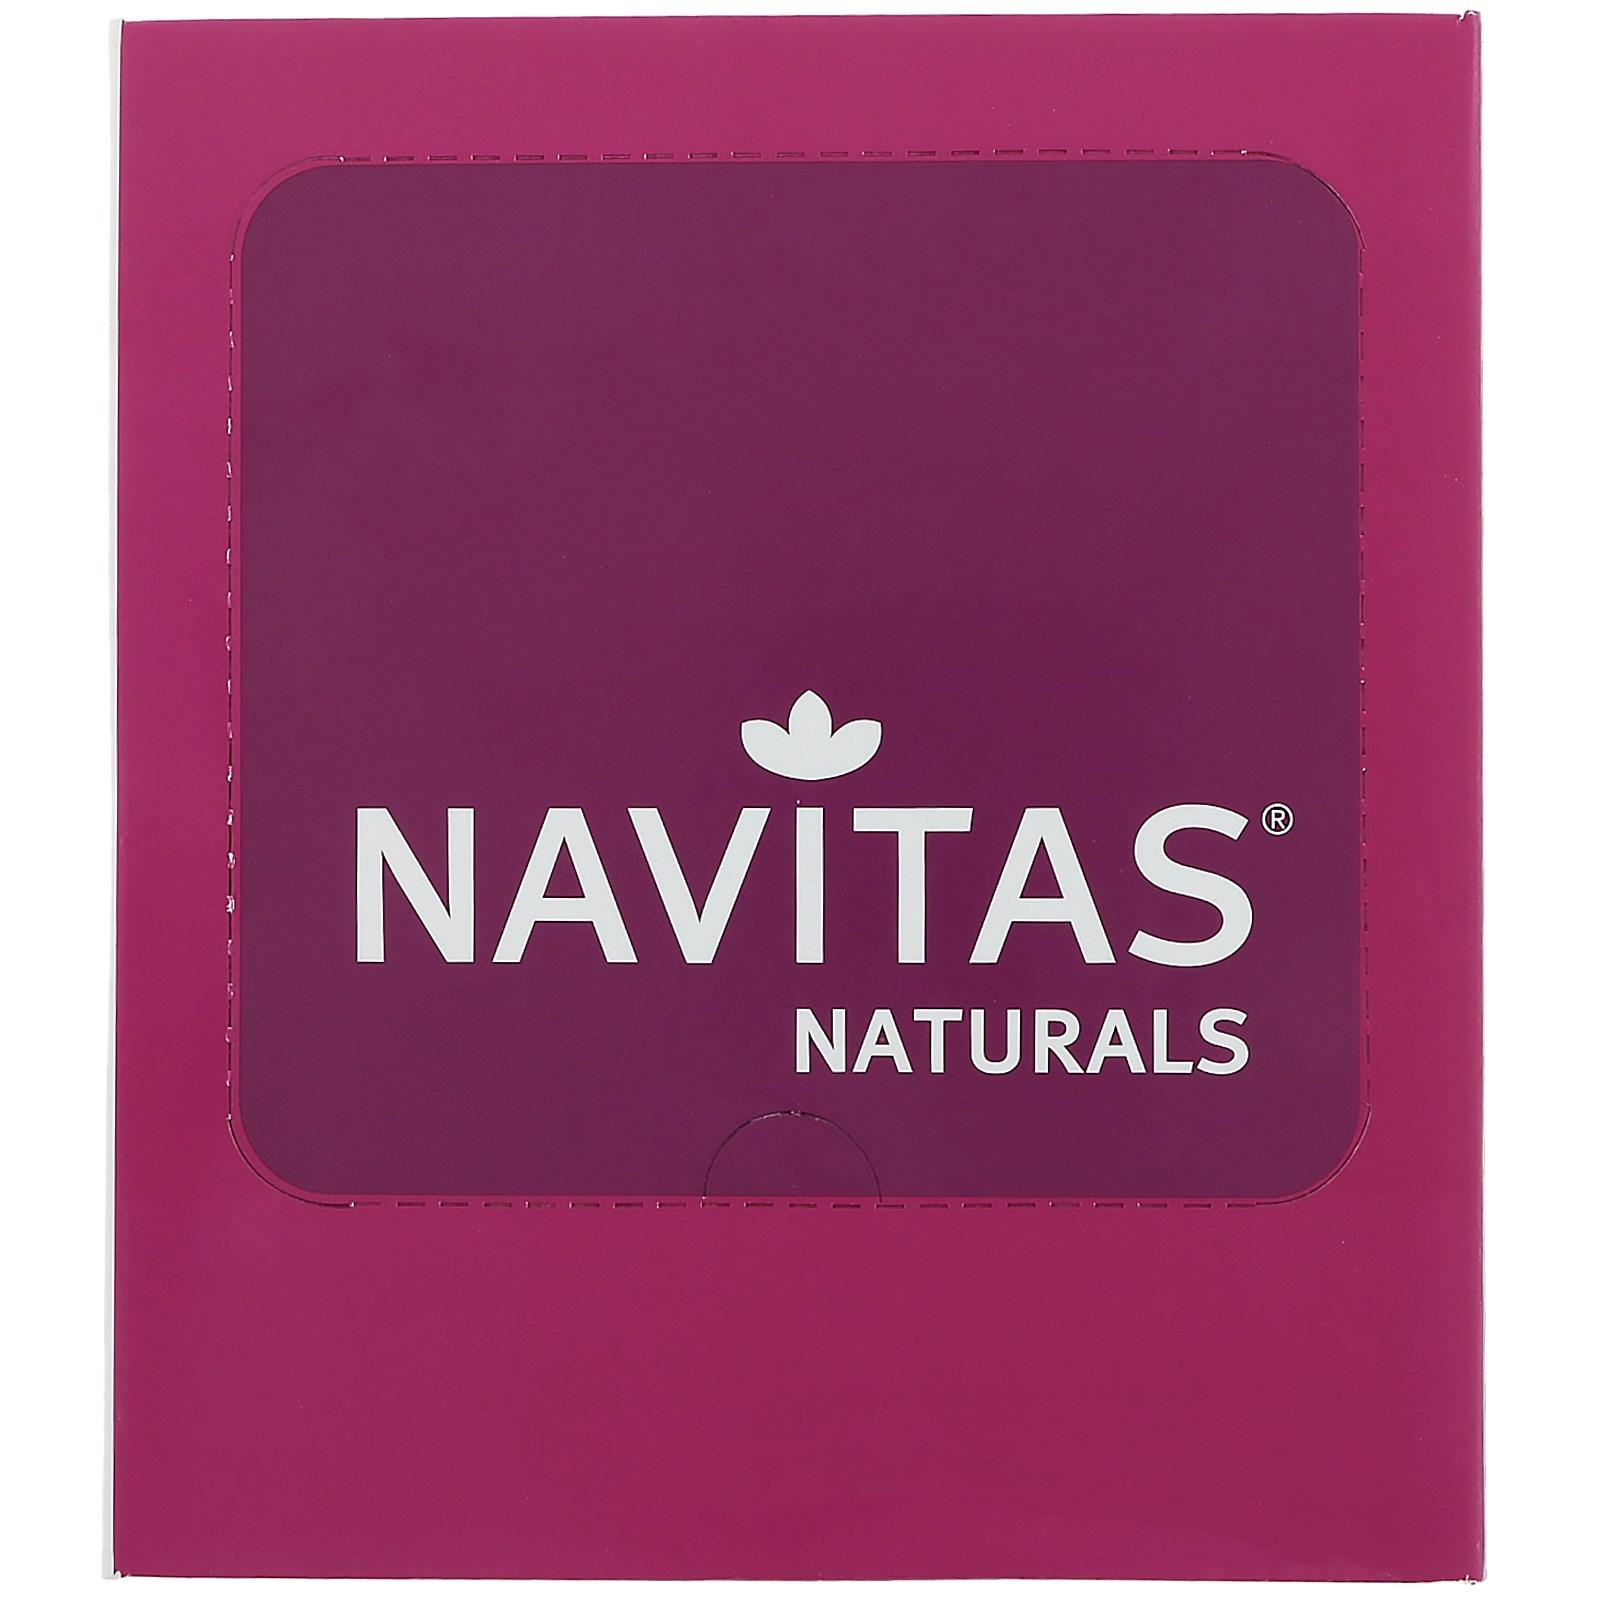 Navitas Organics, Superfood + Goji, Goji Acai, 12 Bars, 16.8 oz (480 g)